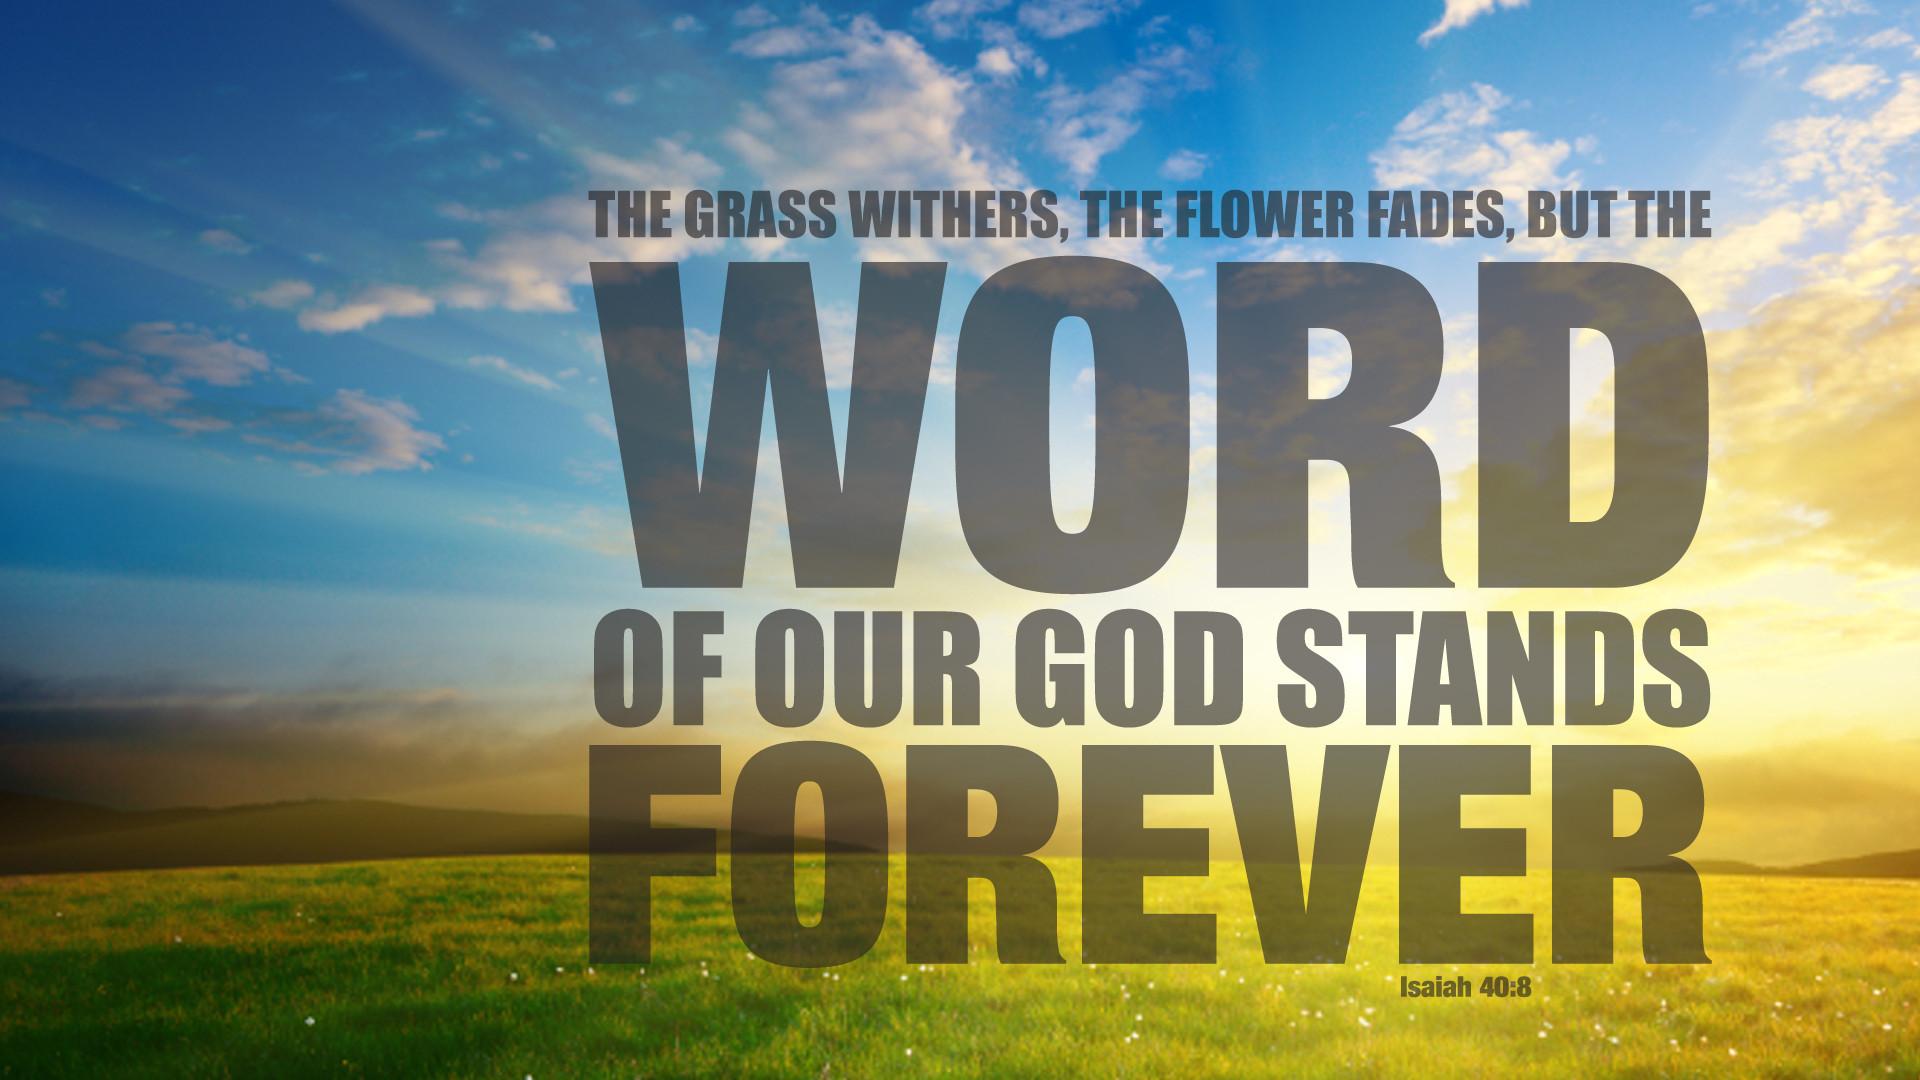 Christian Screensavers Scripture